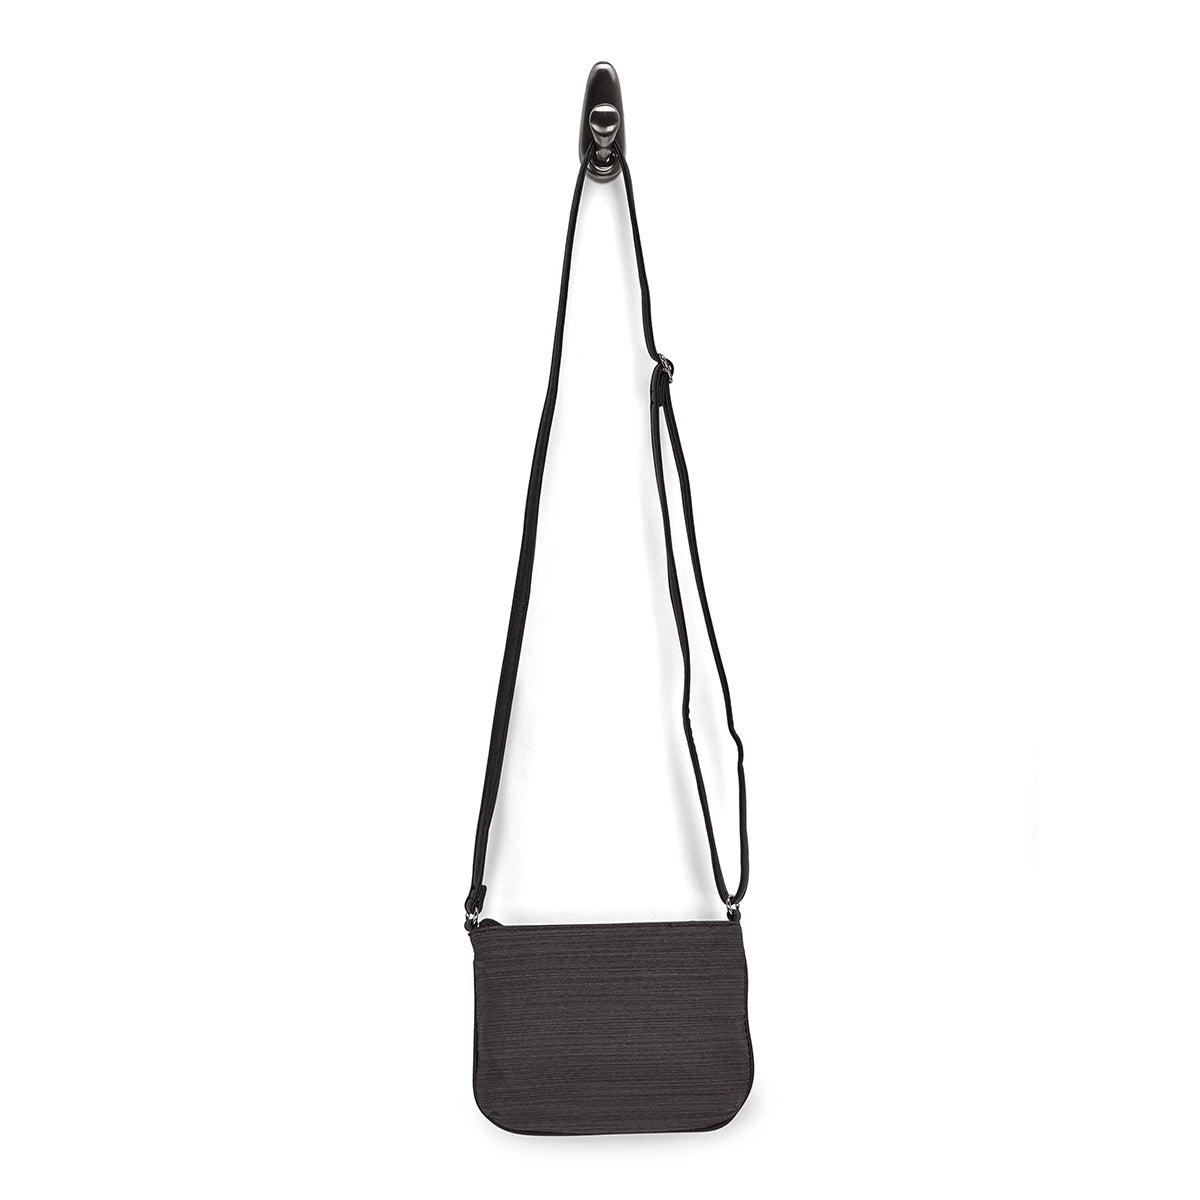 Lds black crossbody bag